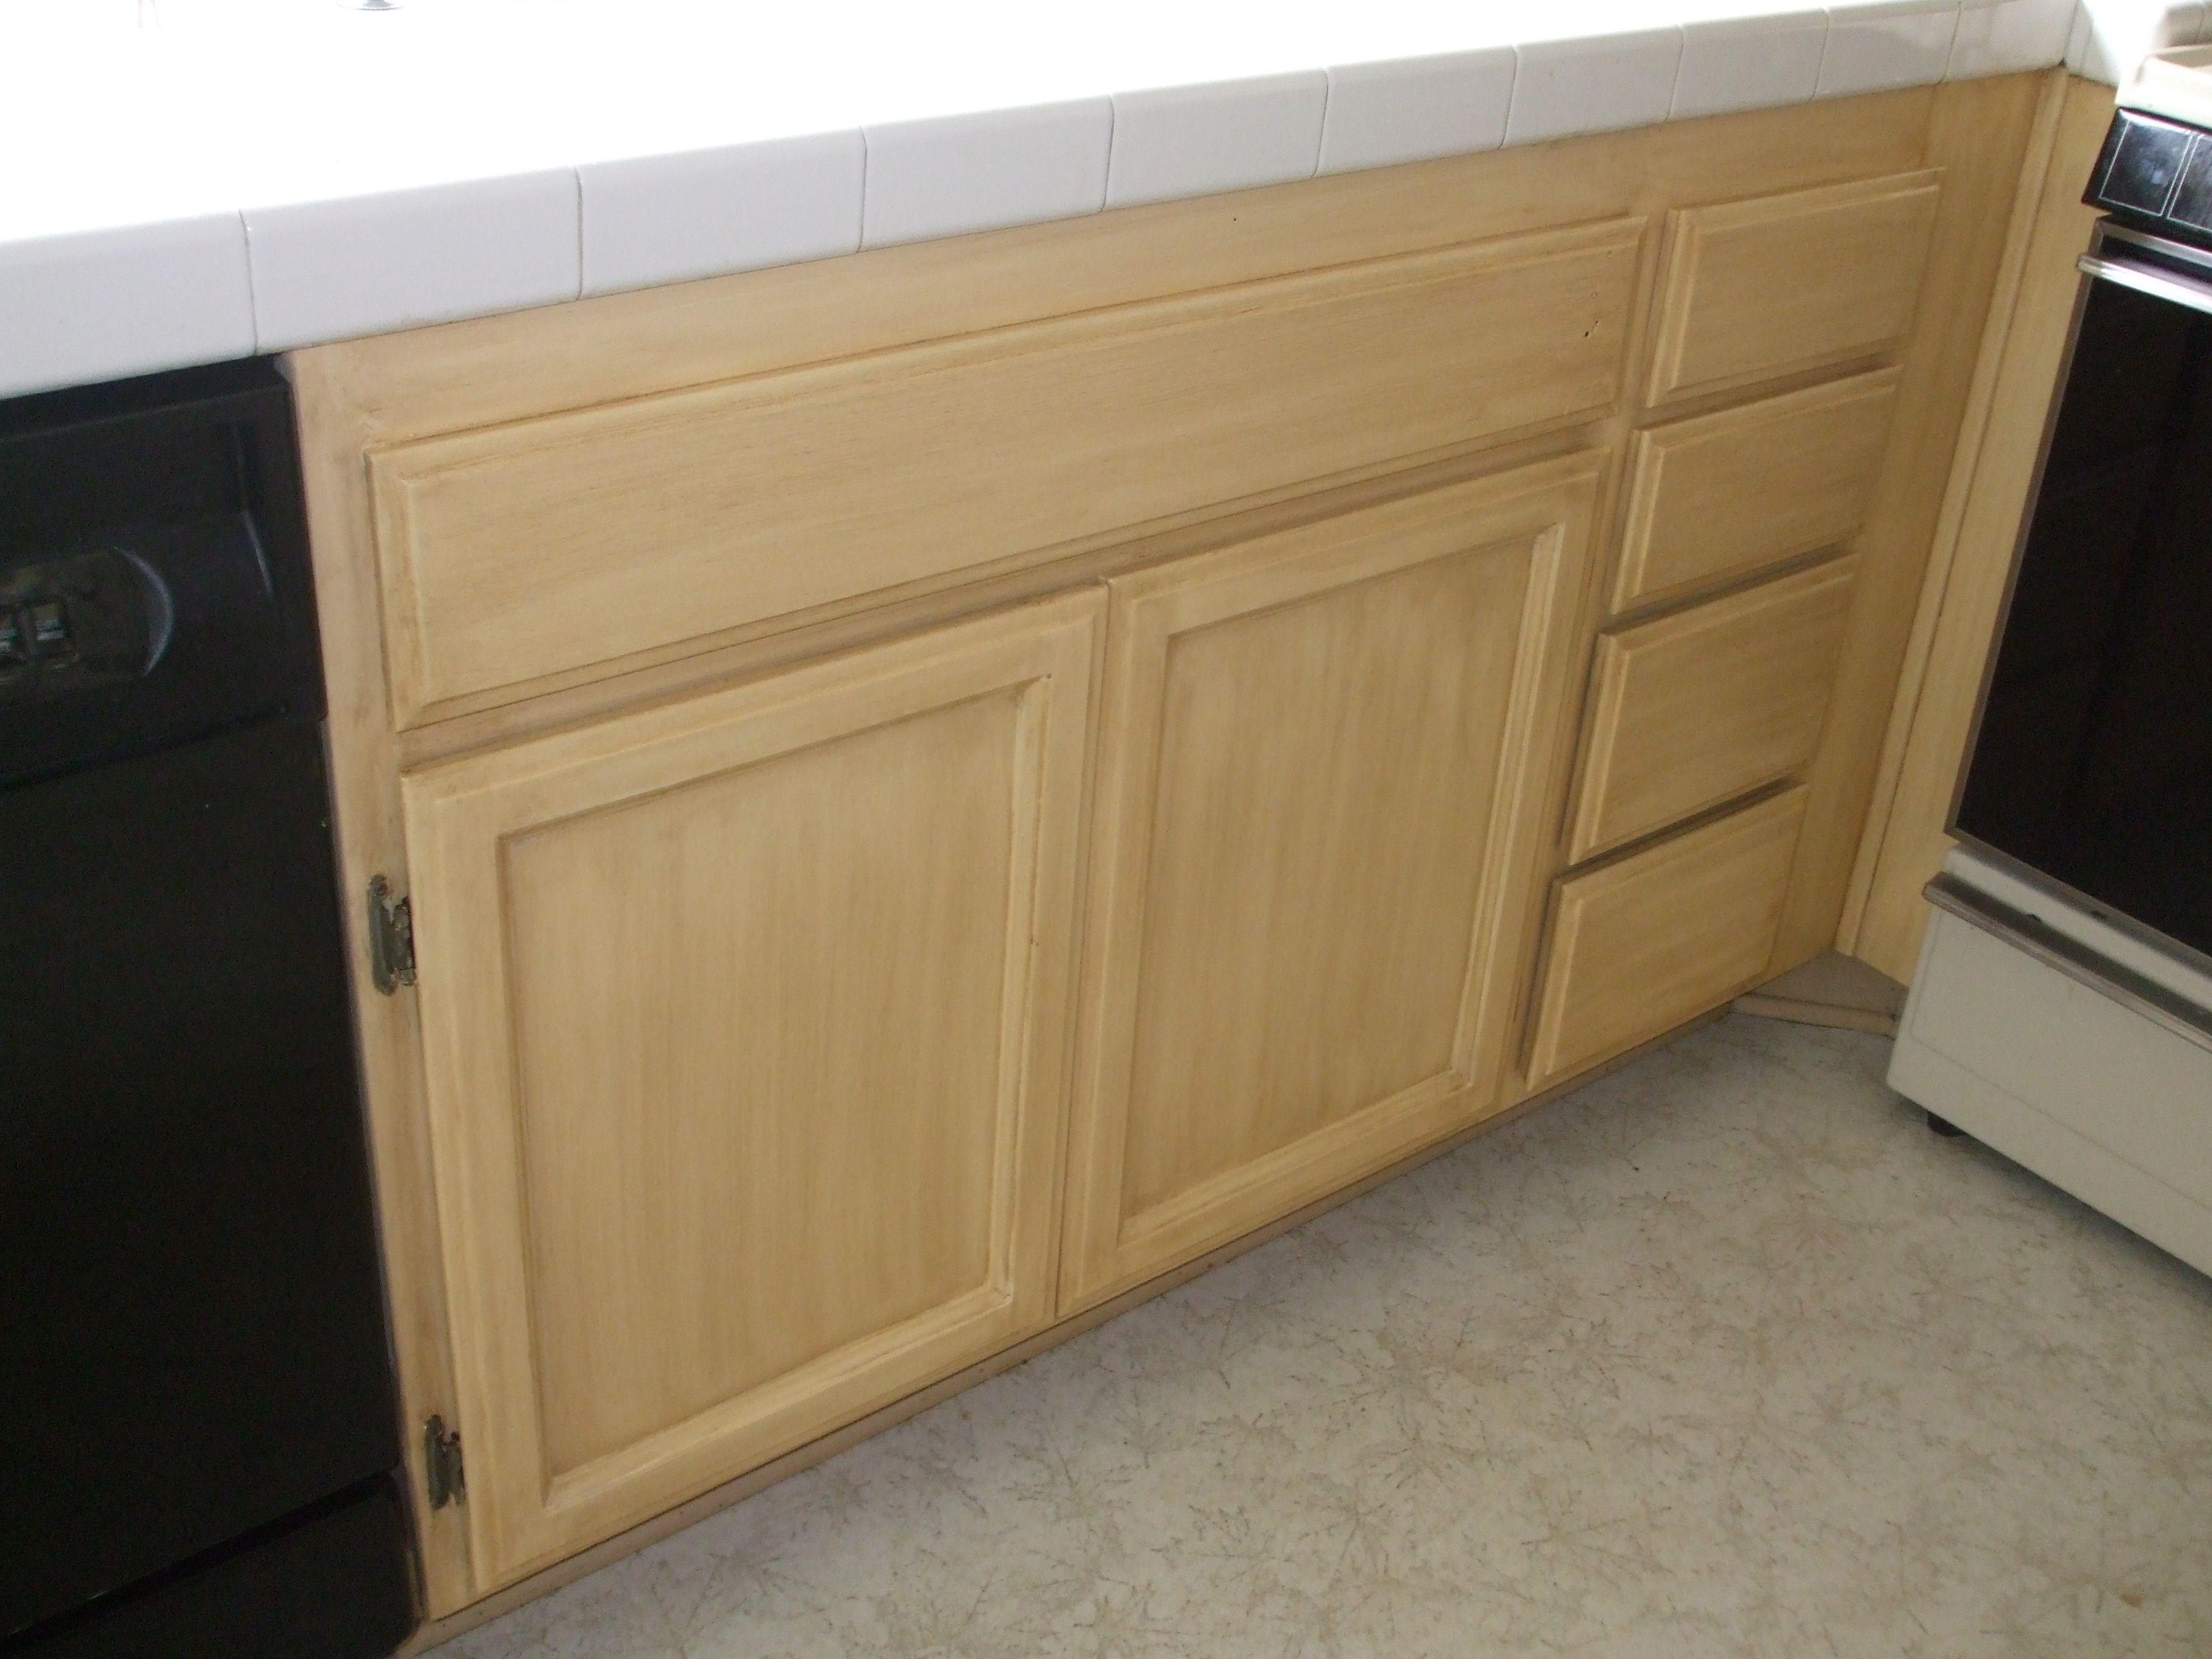 amusing cream kitchen cabinets | English Cream:Testimonial Gallery: Rust-Oleum Cabinet ...